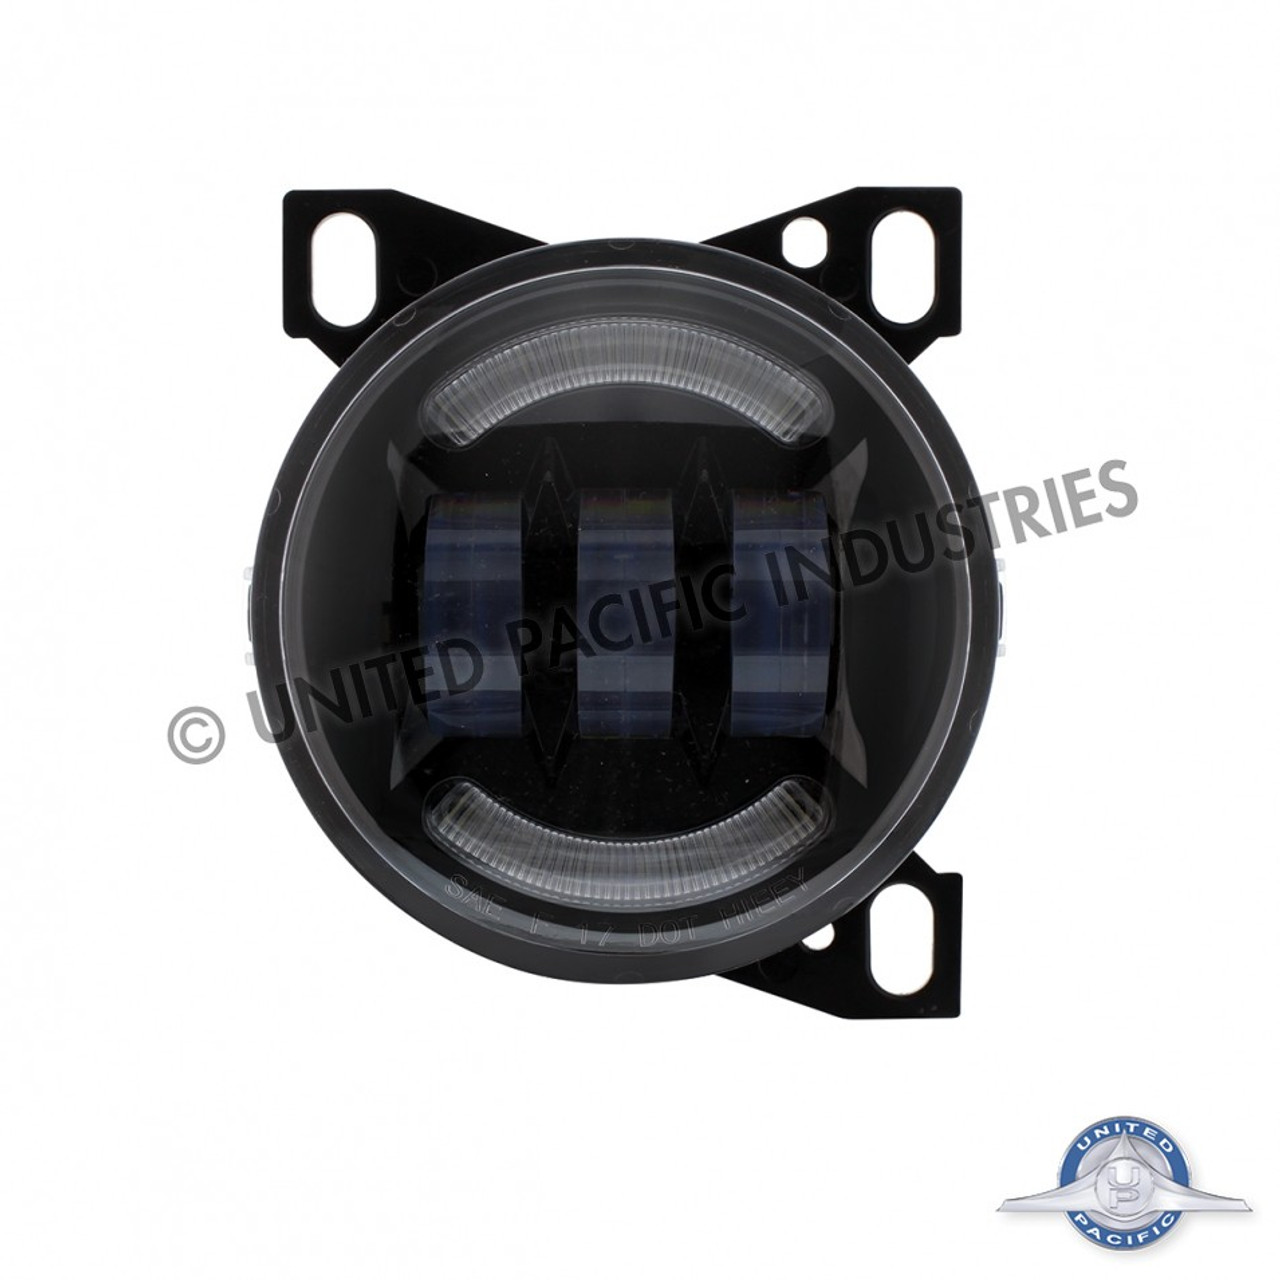 medium resolution of united pacific 4 1 4 black round led fog light with led position light